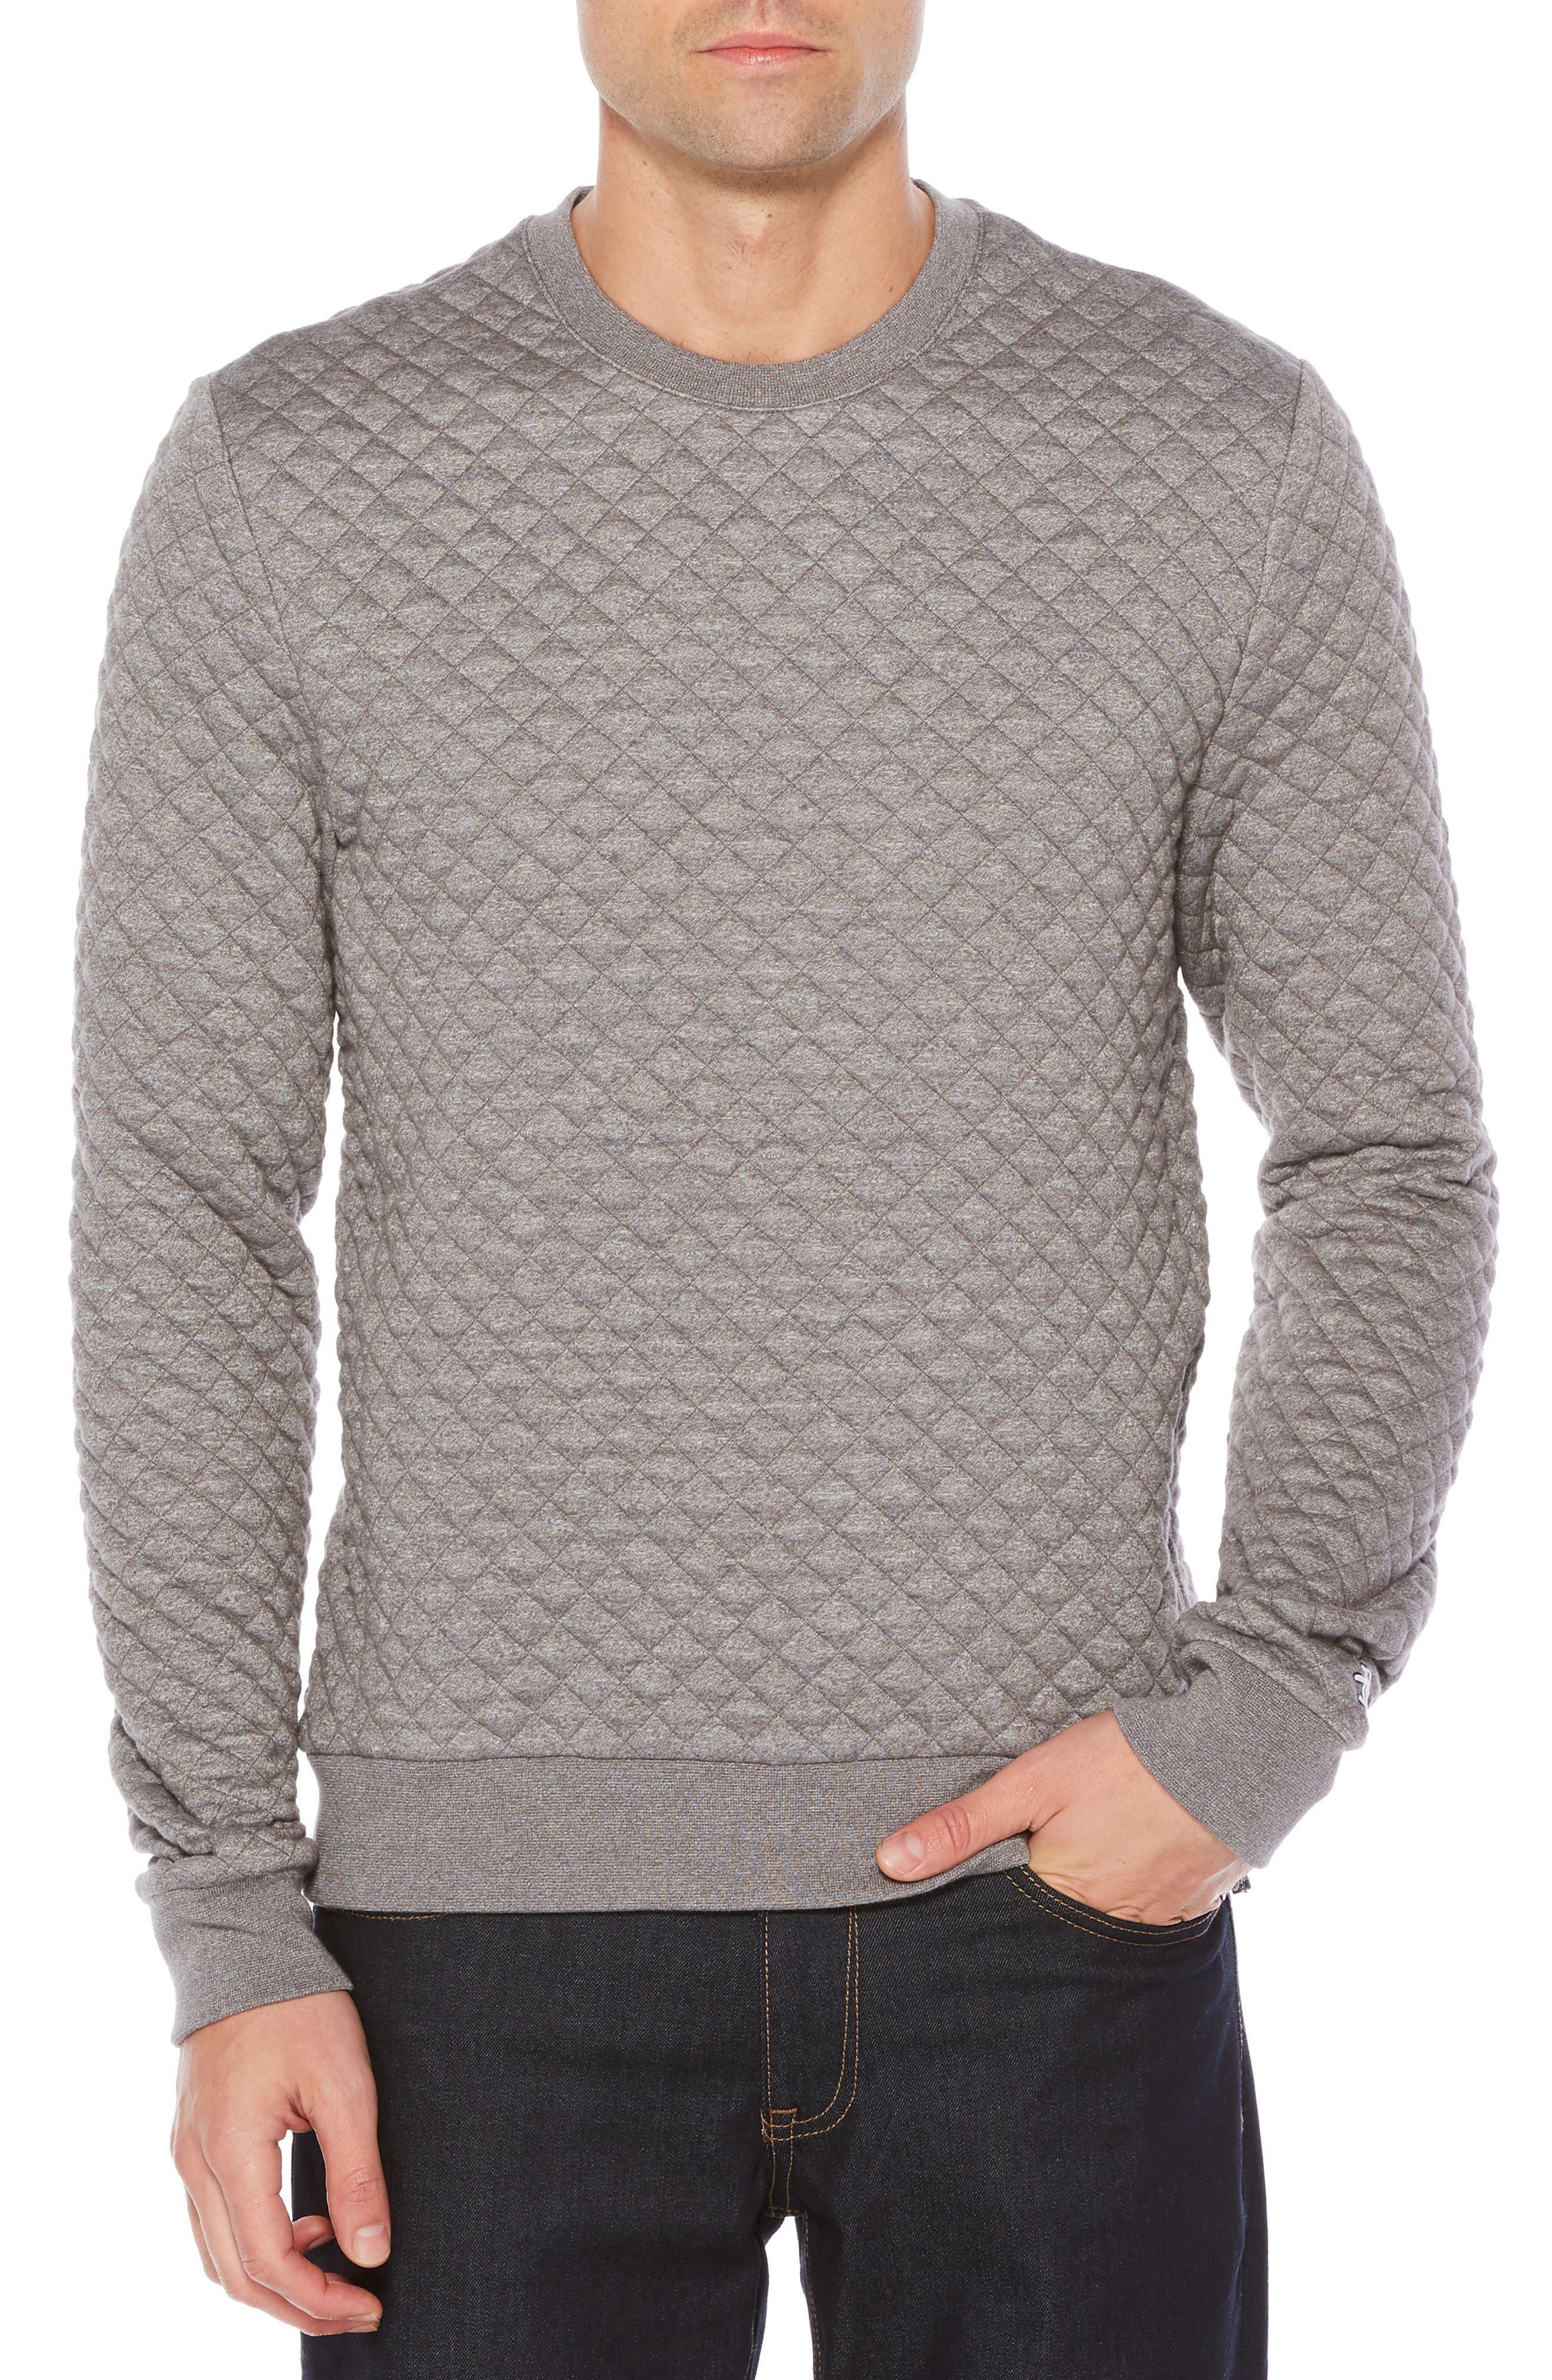 Main Image - Original Penguin Quilted Sweater